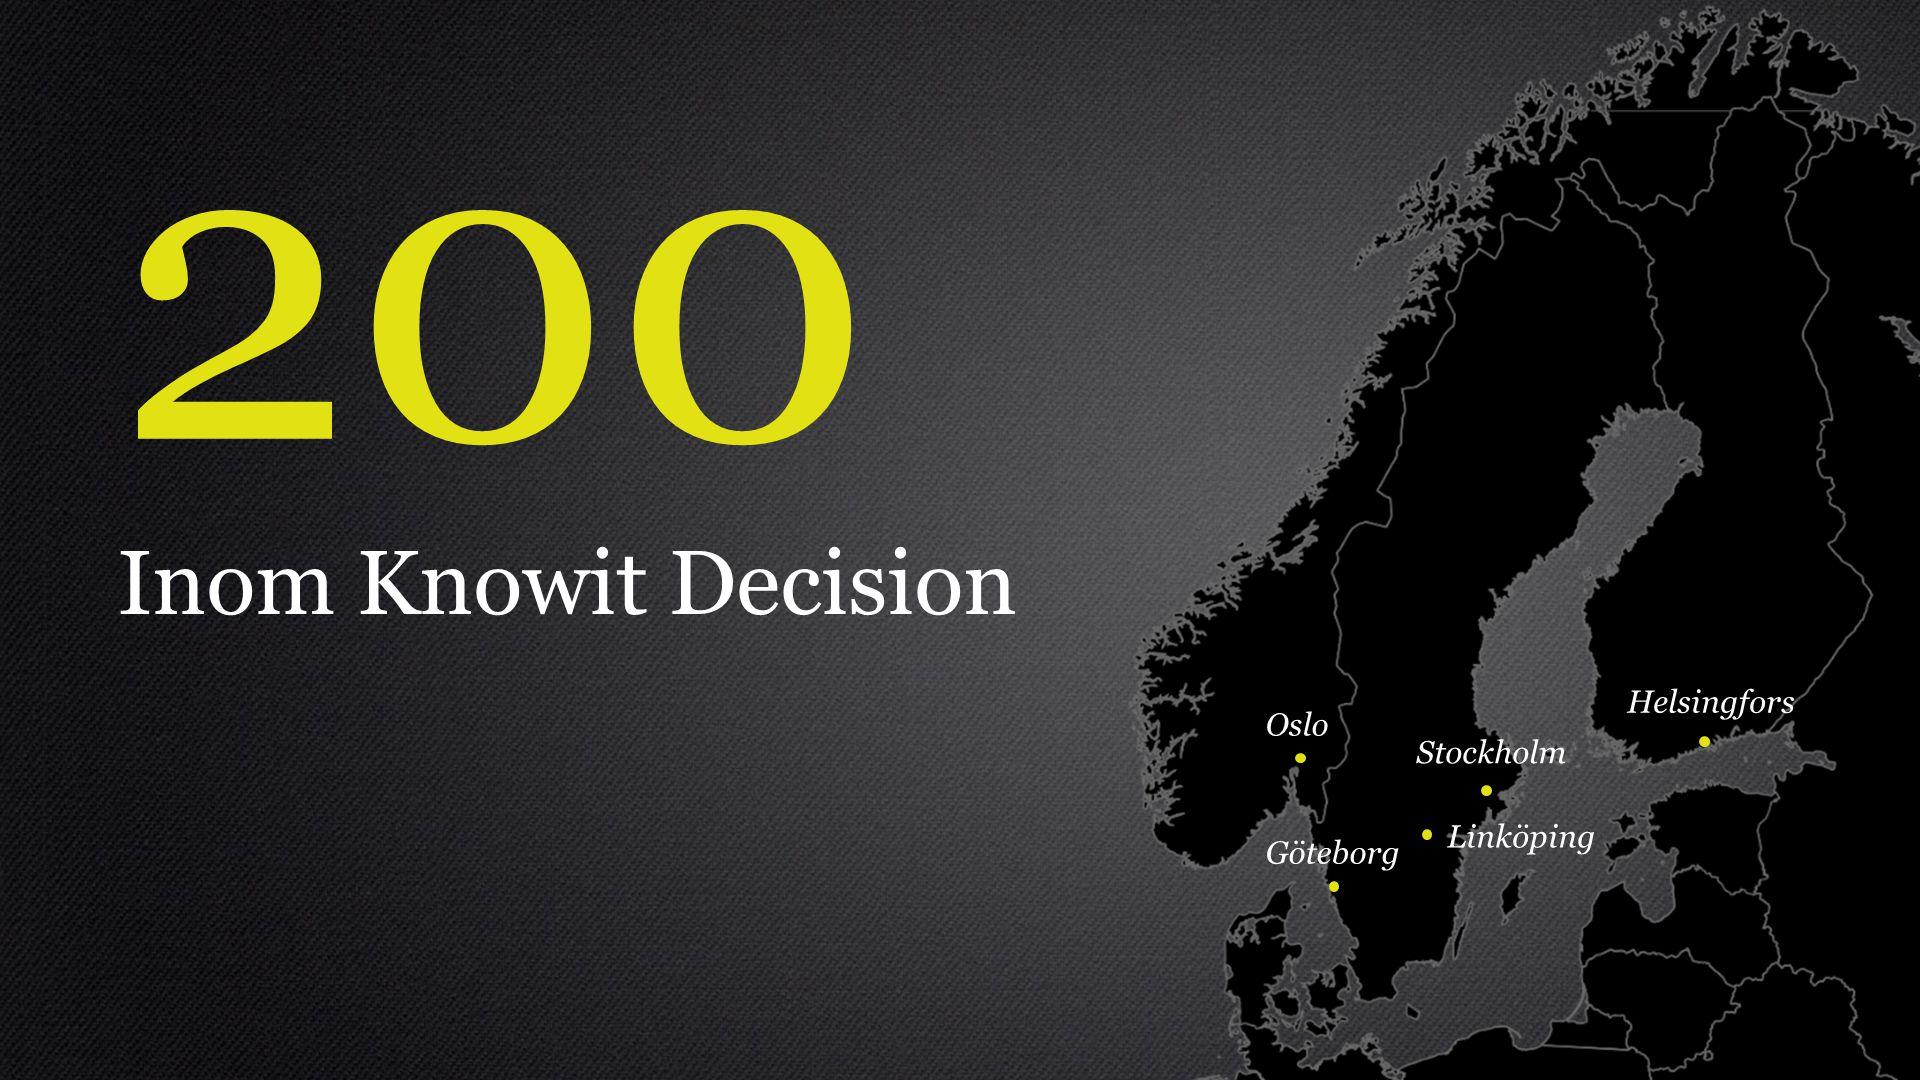 200 Inom Knowit Decision Helsingfors Oslo Stockholm Linköping Göteborg